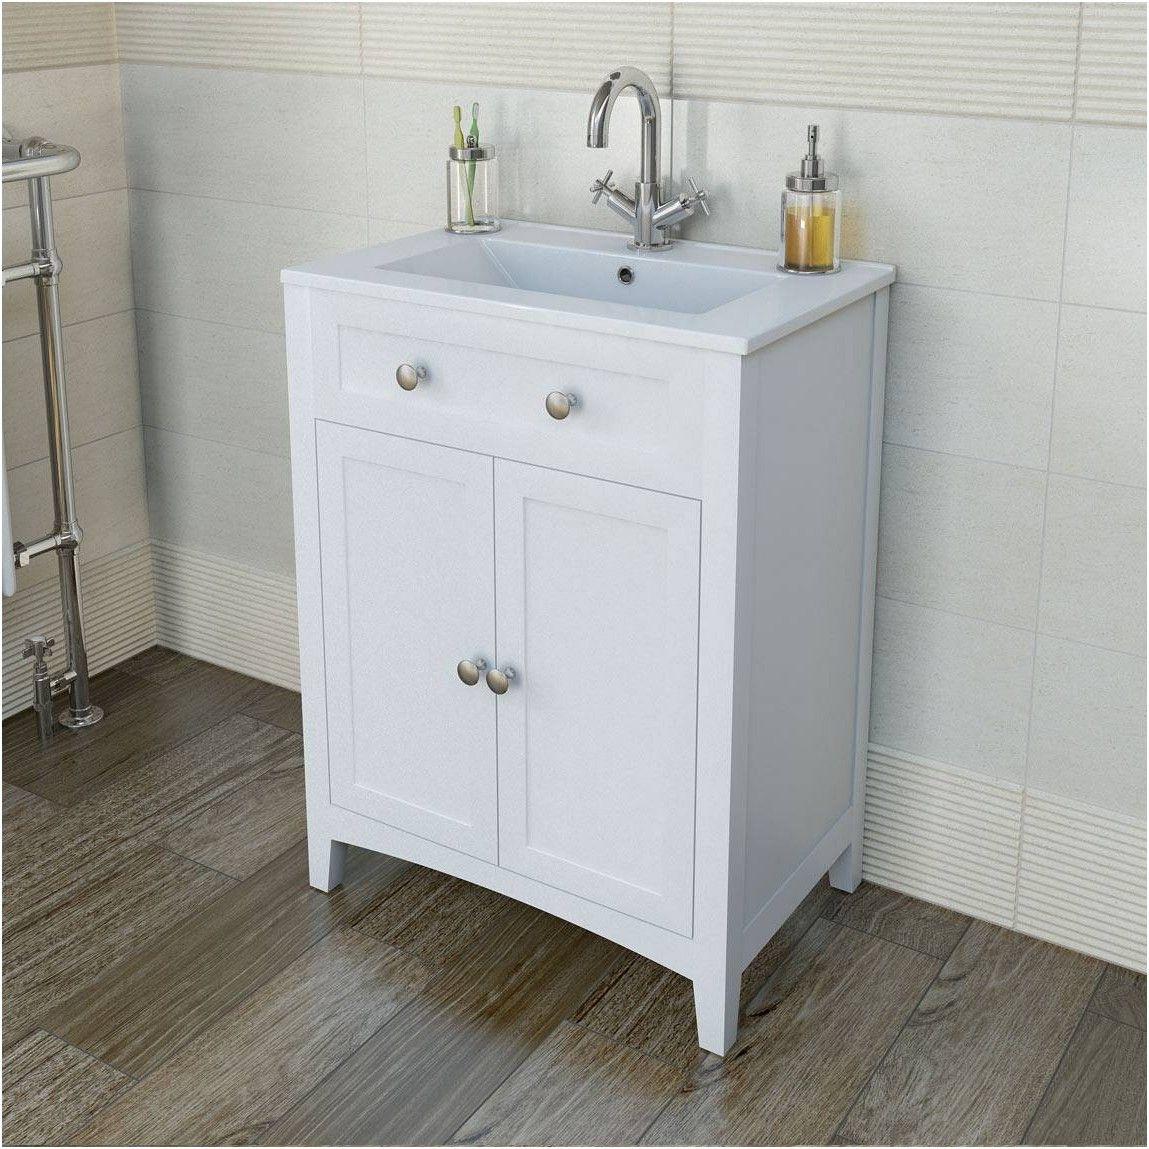 camberley white 600 door unit basin toriaplumb from White Bathroom ...